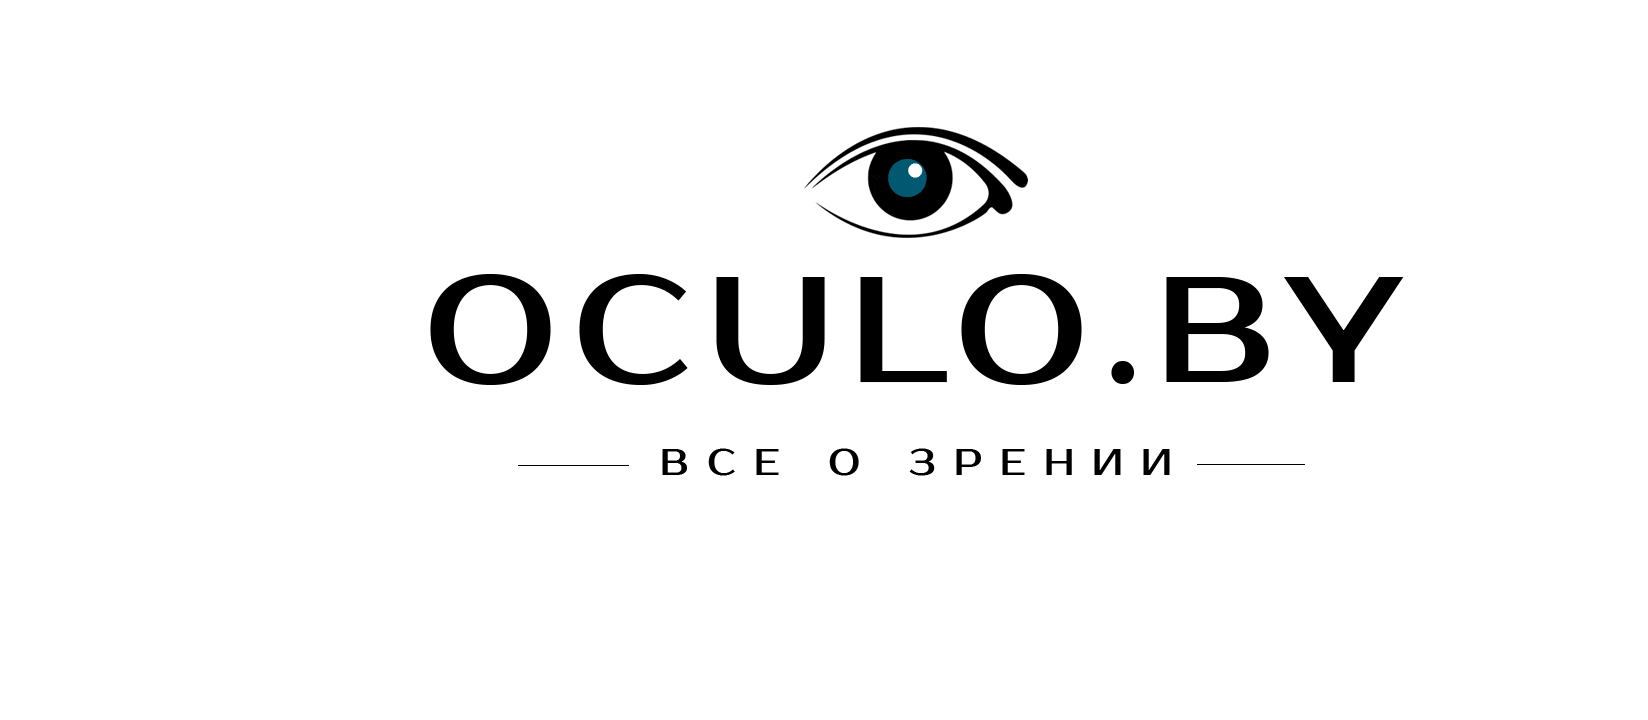 oculo by логотип